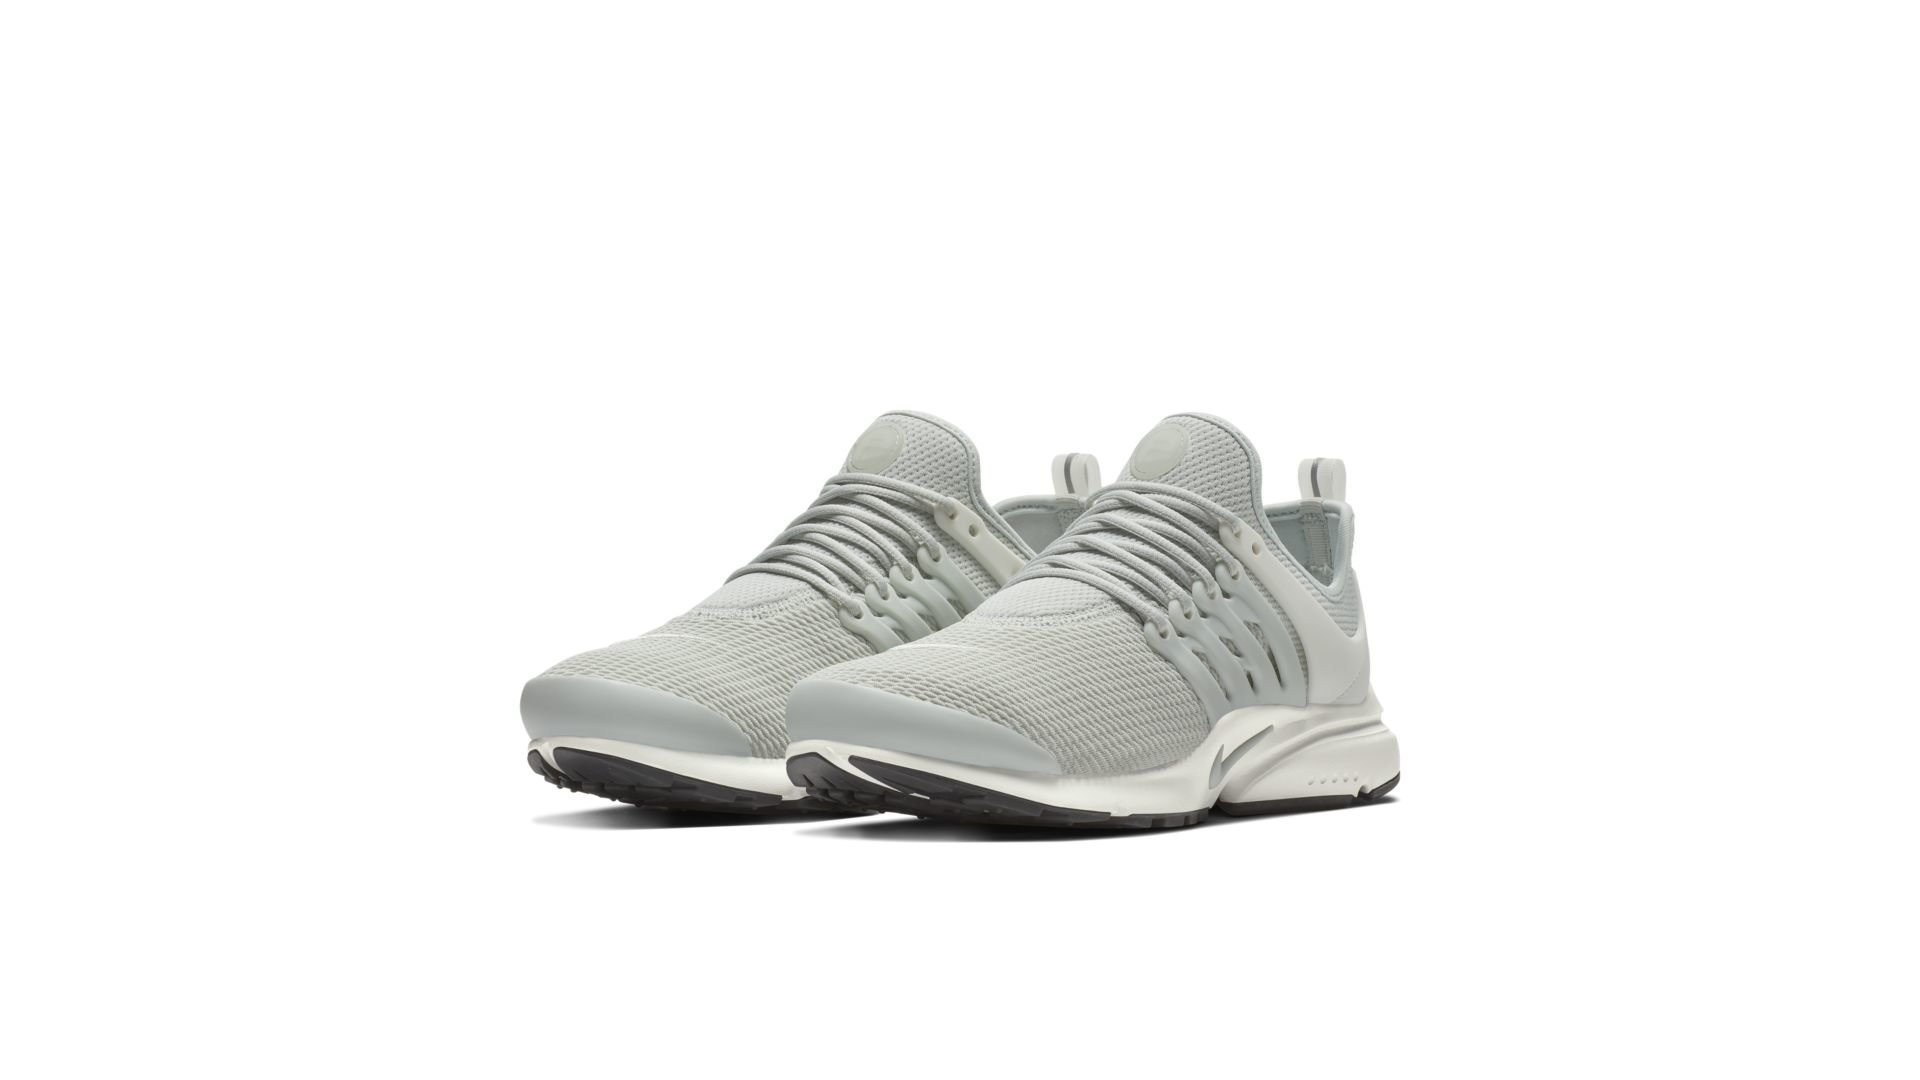 Nike Air Presto Light Silver (W) (878068-017)